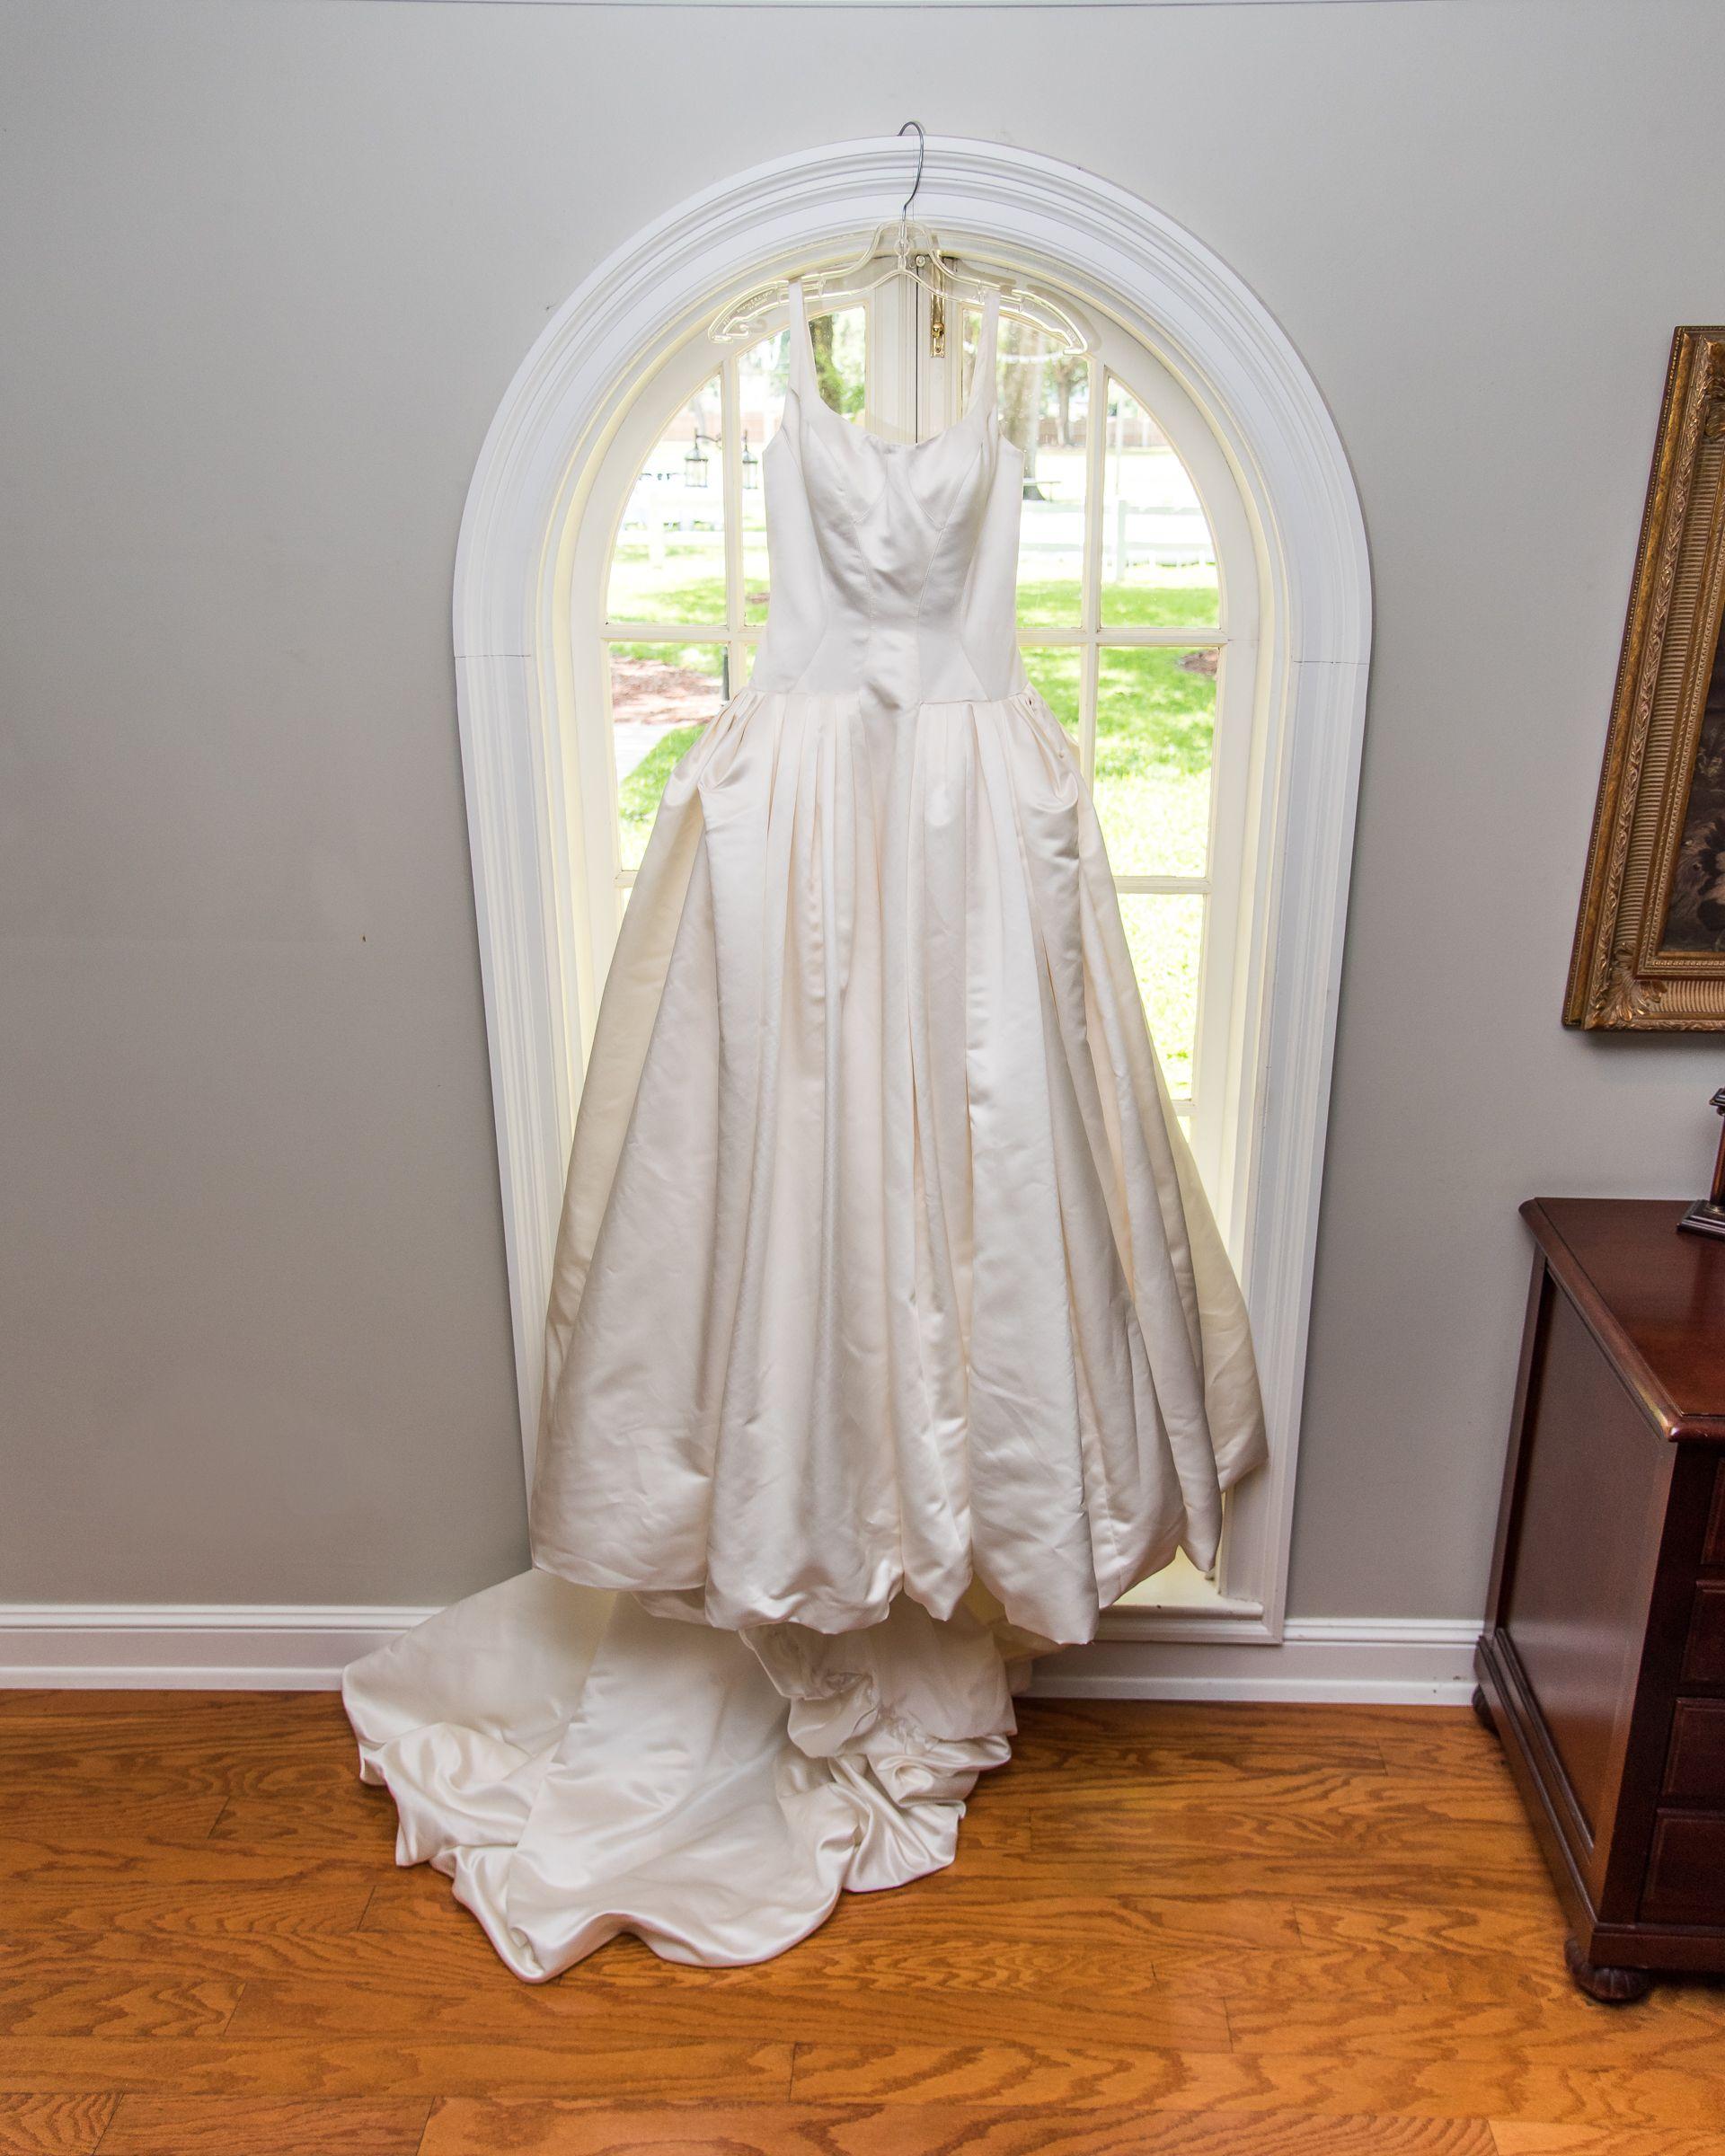 Ball Gown In Window At Casa Lantana Brandon FloridaBall GownsDestination WeddingsWedding